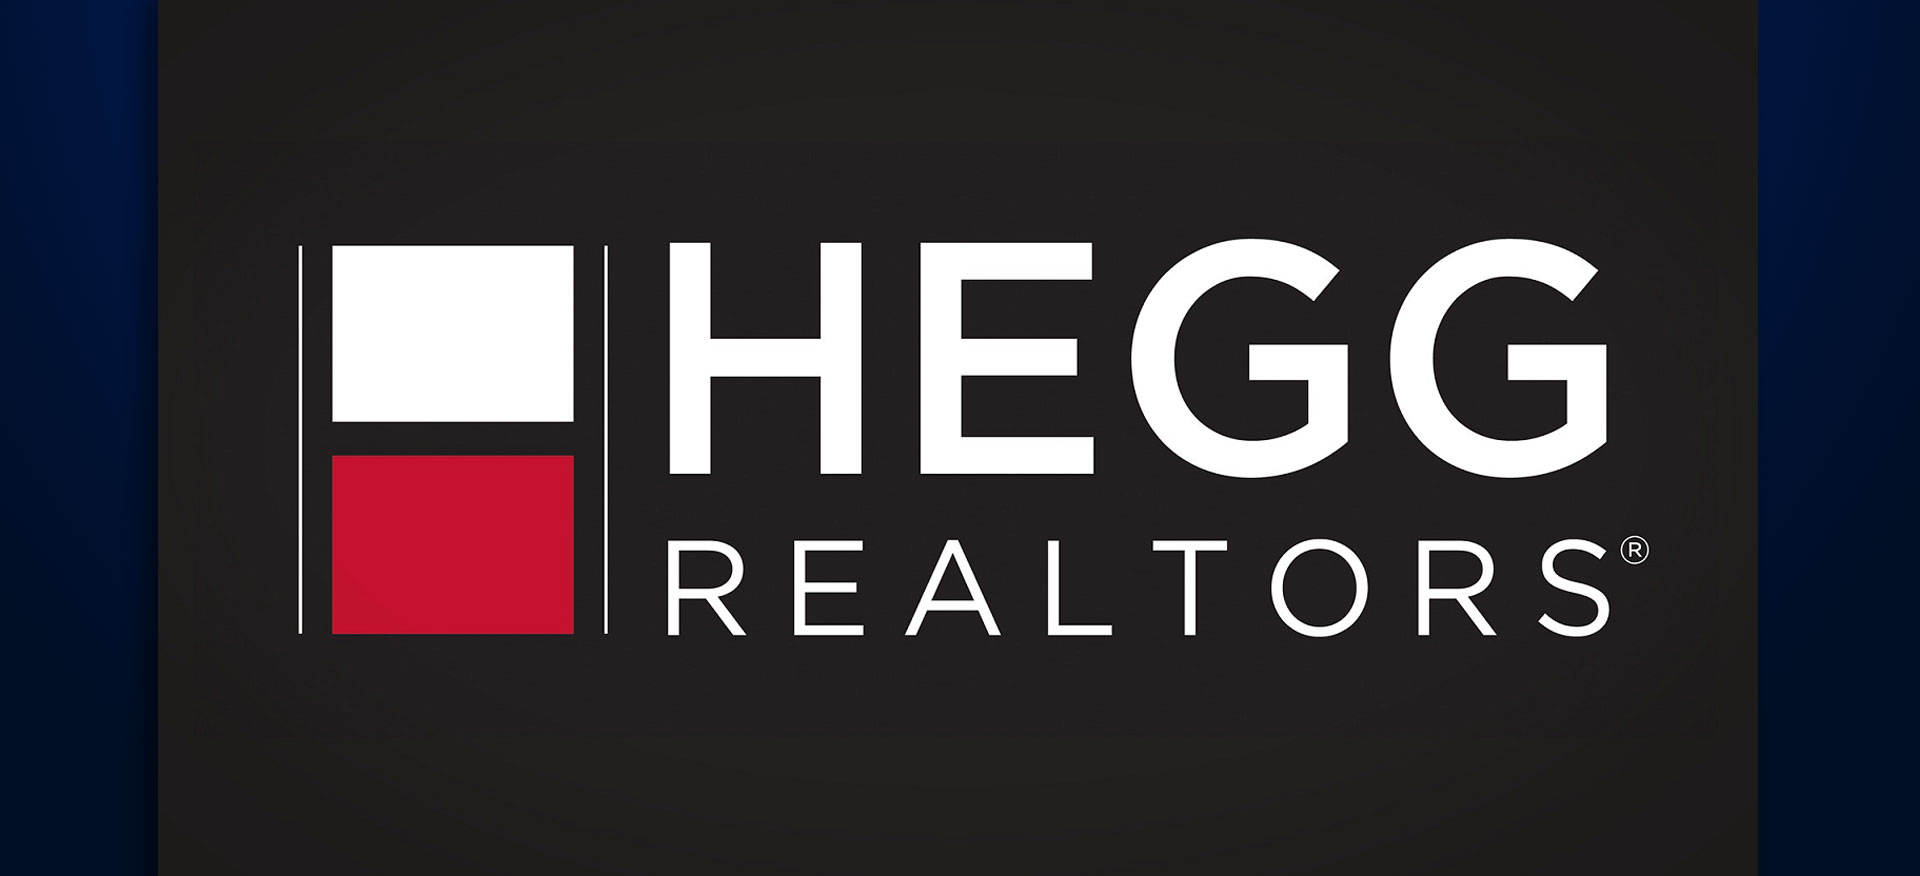 Hegg Realtors logo Sioux Falls